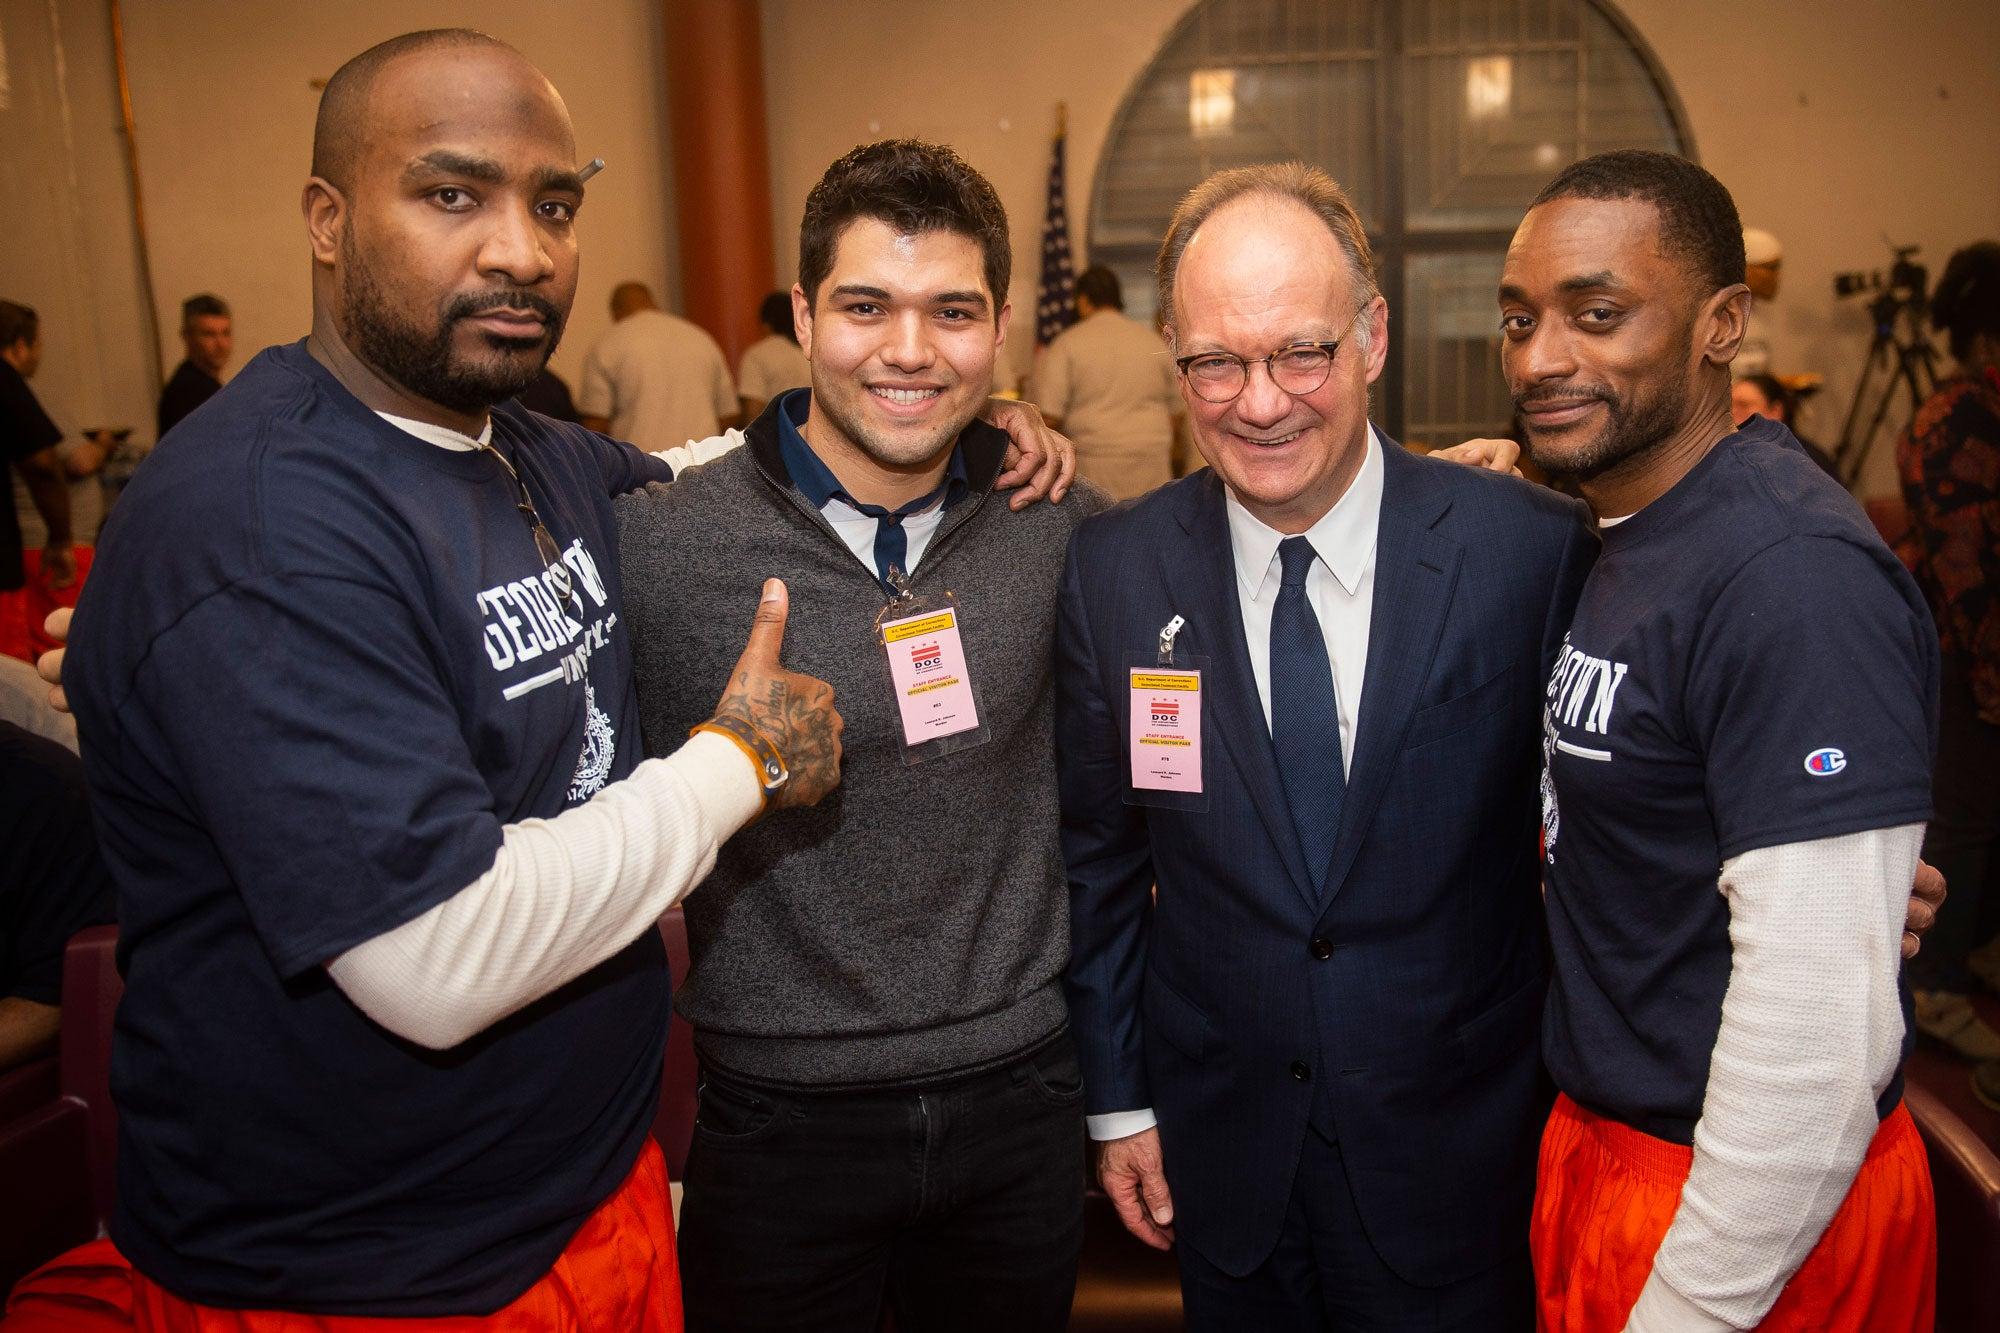 Warren Allen with Georgetown student Matt Calderon, Georgetown University President John DeGioia, and classmate Roy Middleton.